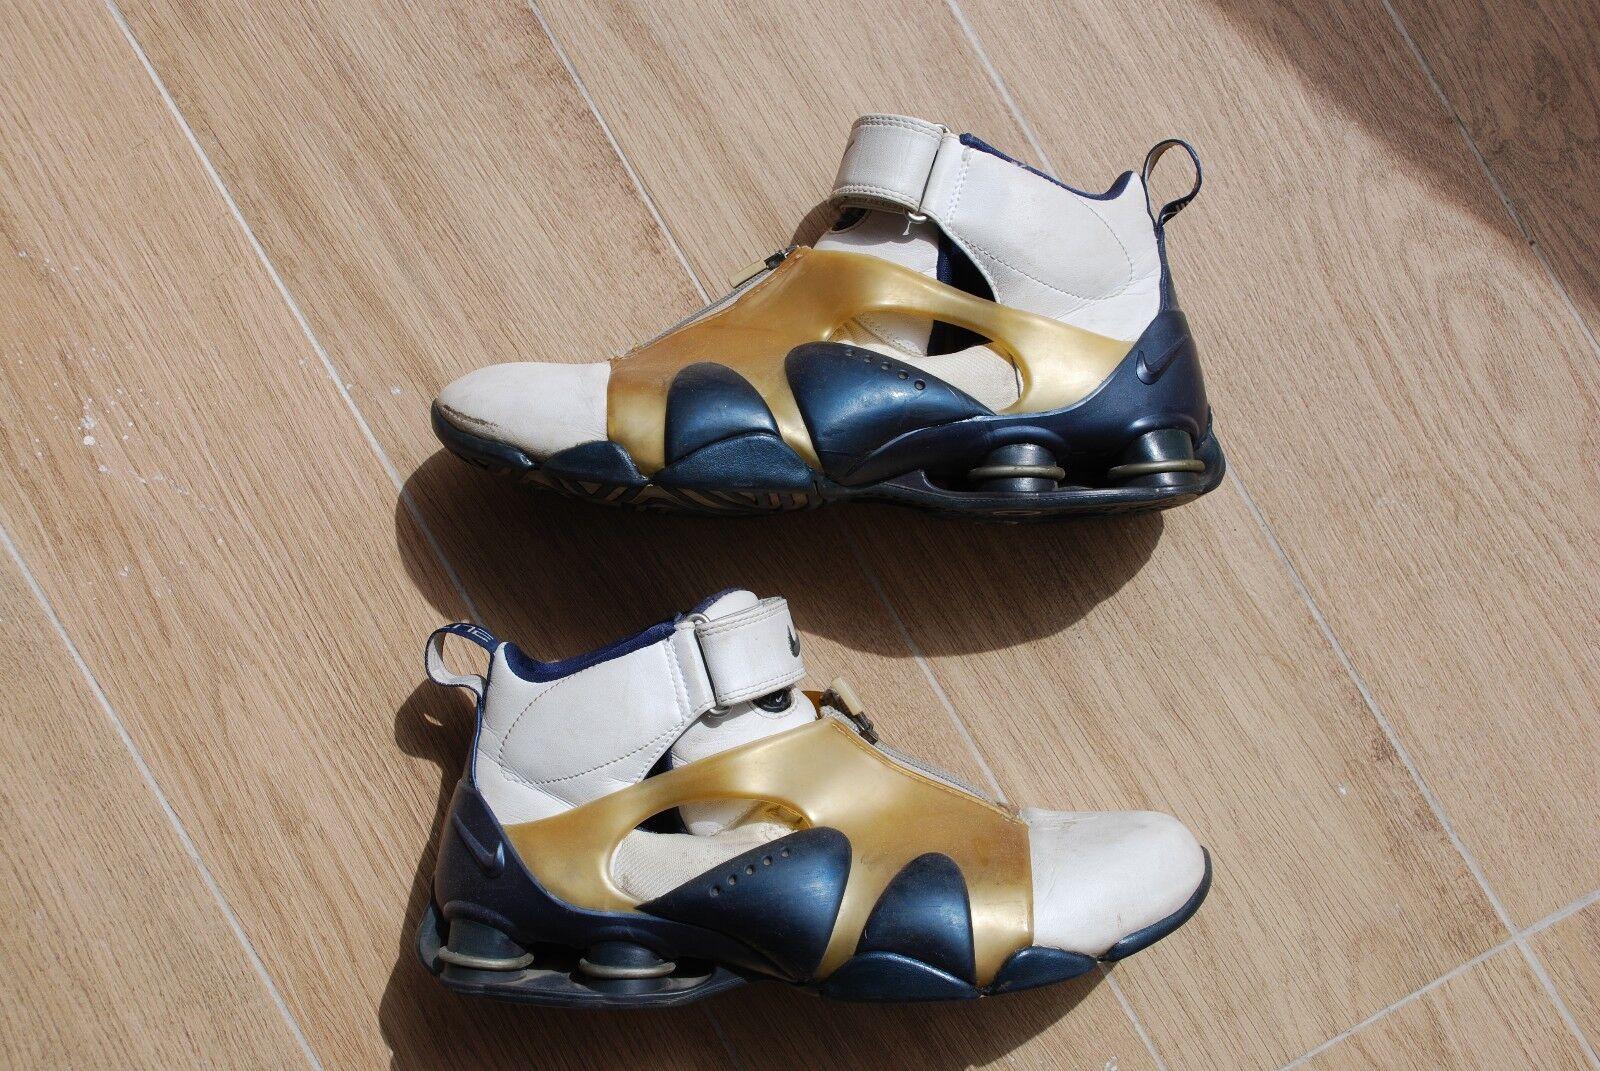 RaRe 2002 Nike SHOX ELITE White And Blue US SZ 10